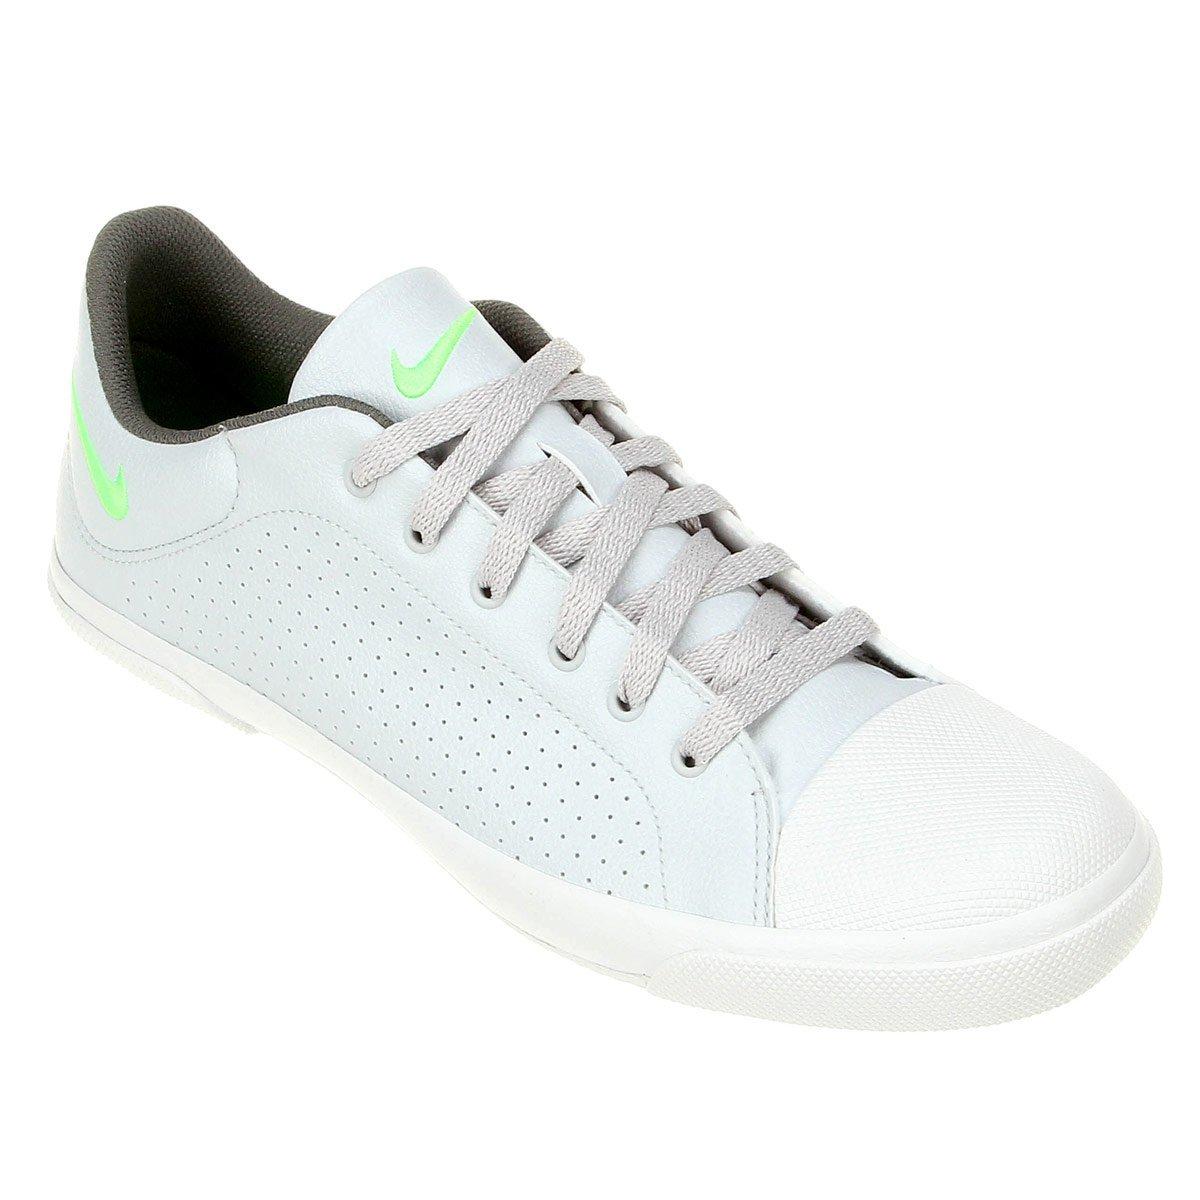 273dbf92796 Tênis Nike Biscuit 2 Sl - Compre Agora